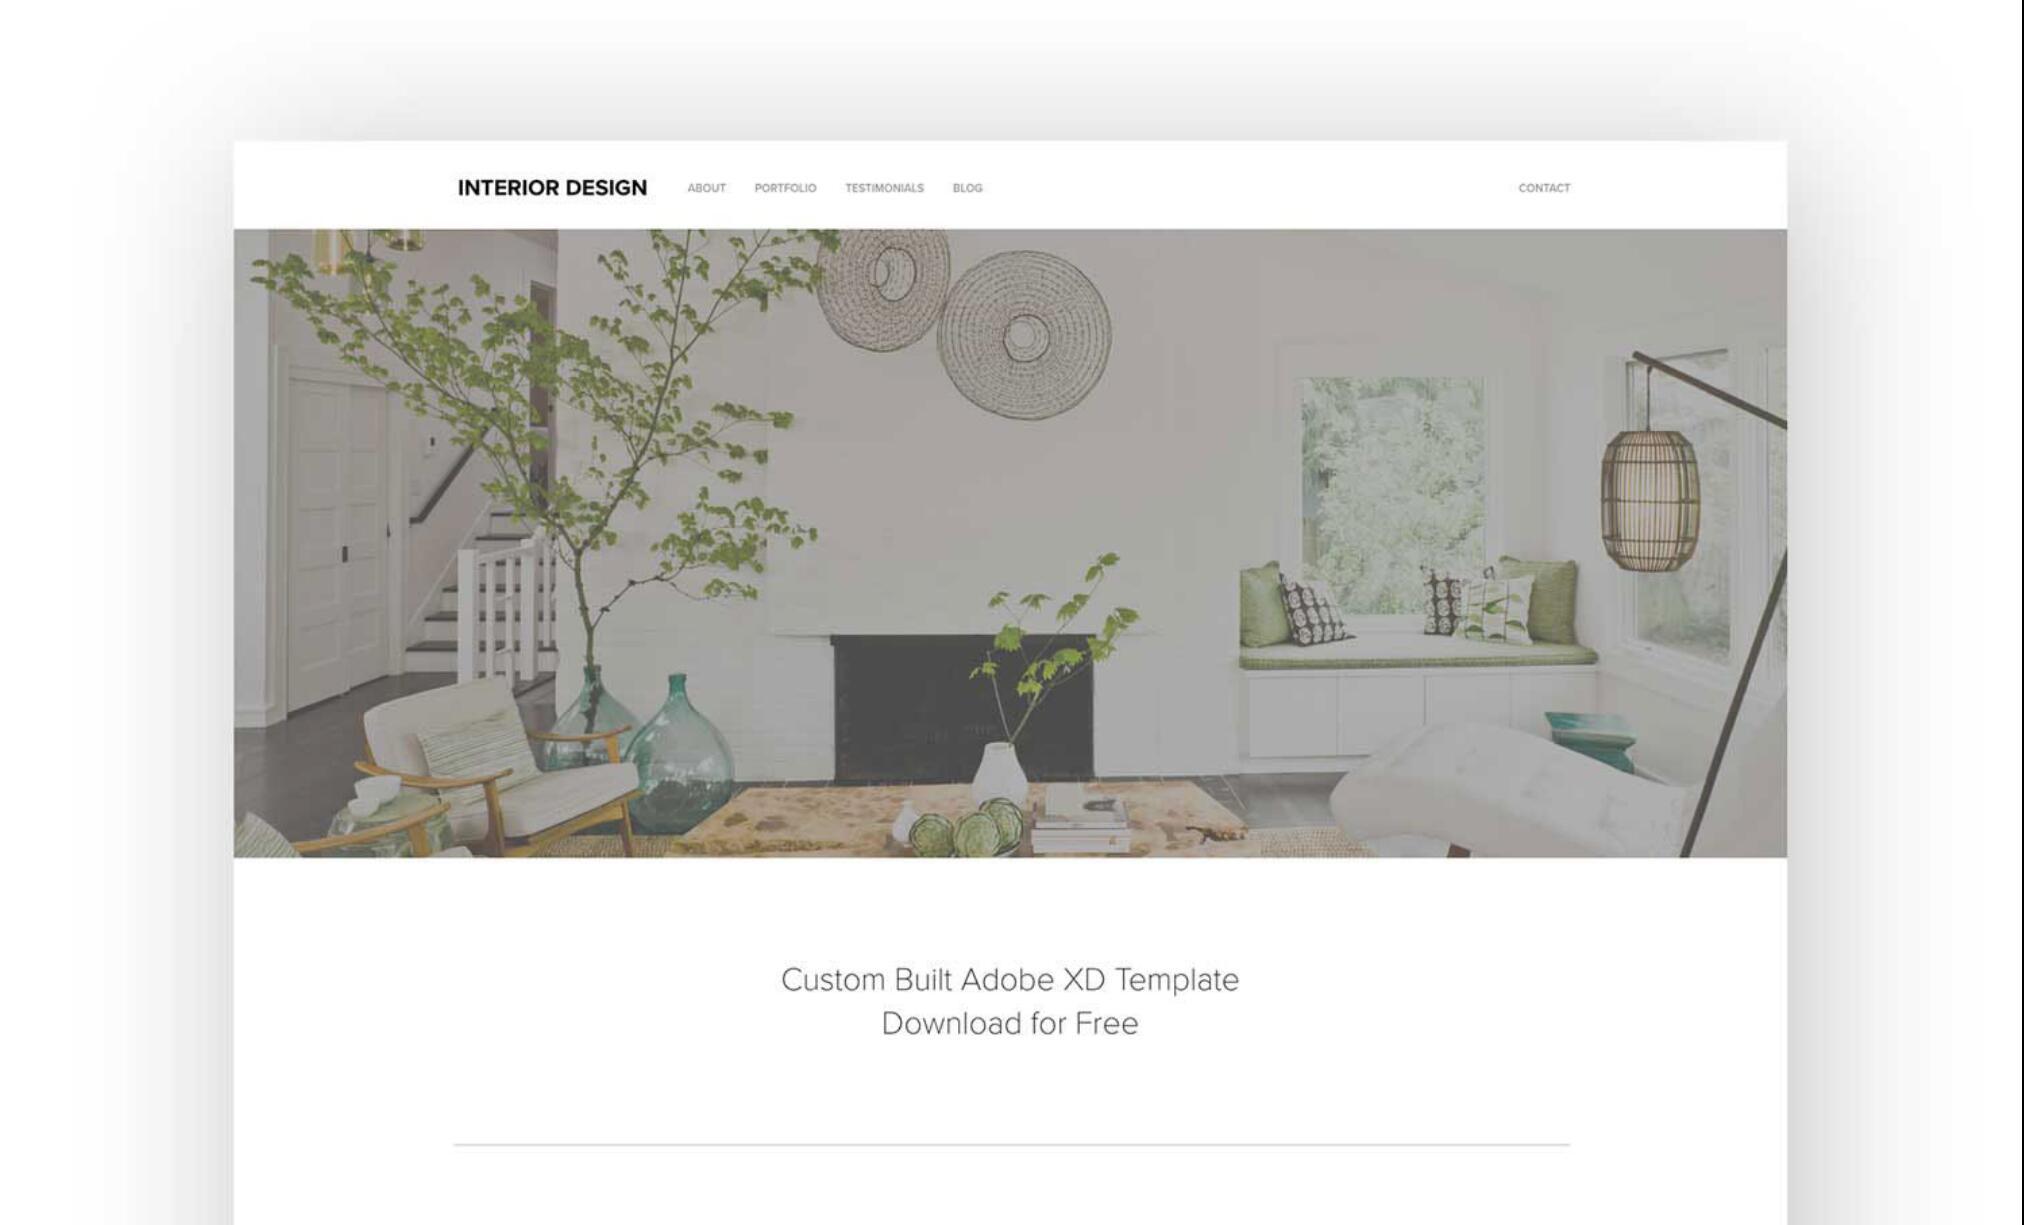 AdobeXD 网页模板